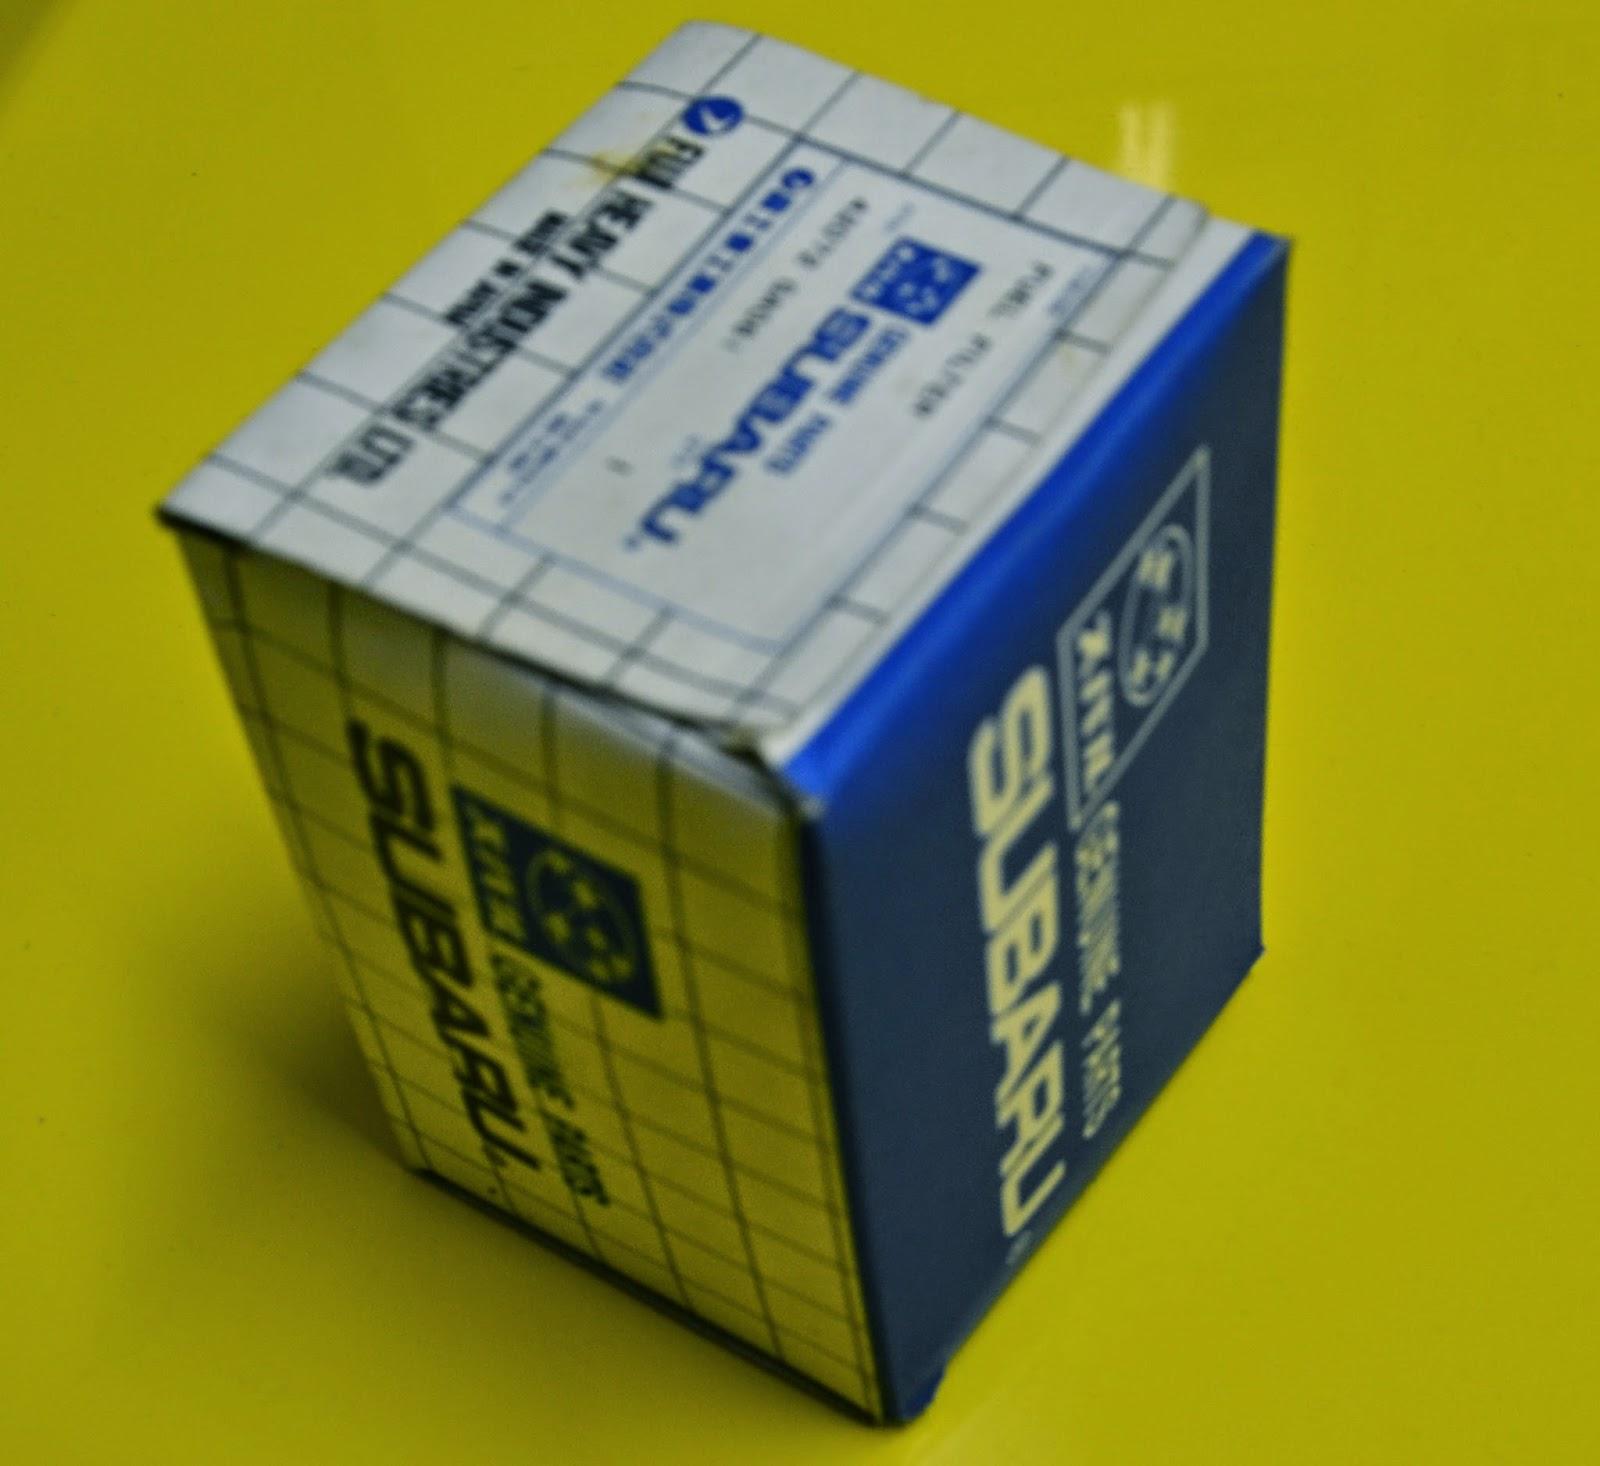 hight resolution of honda civic 96 00 hb tailgate dampers showa price 20